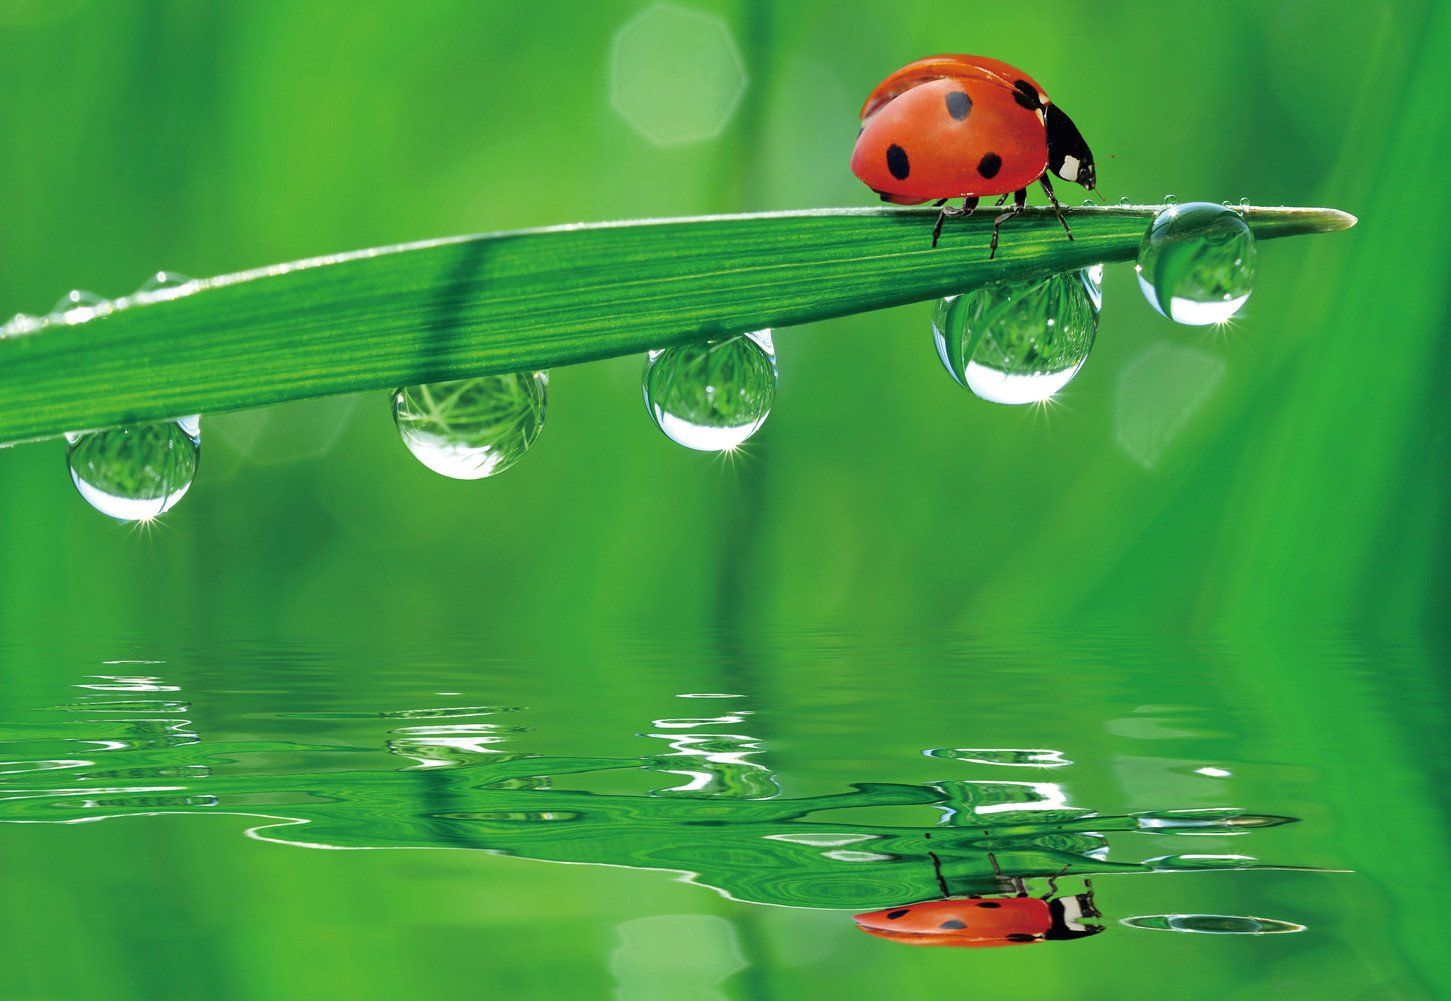 CHOIS Custom Films CF3301 Animal Ladybird Green Drops Glass Window Frosted DIY 4' W by 3' H